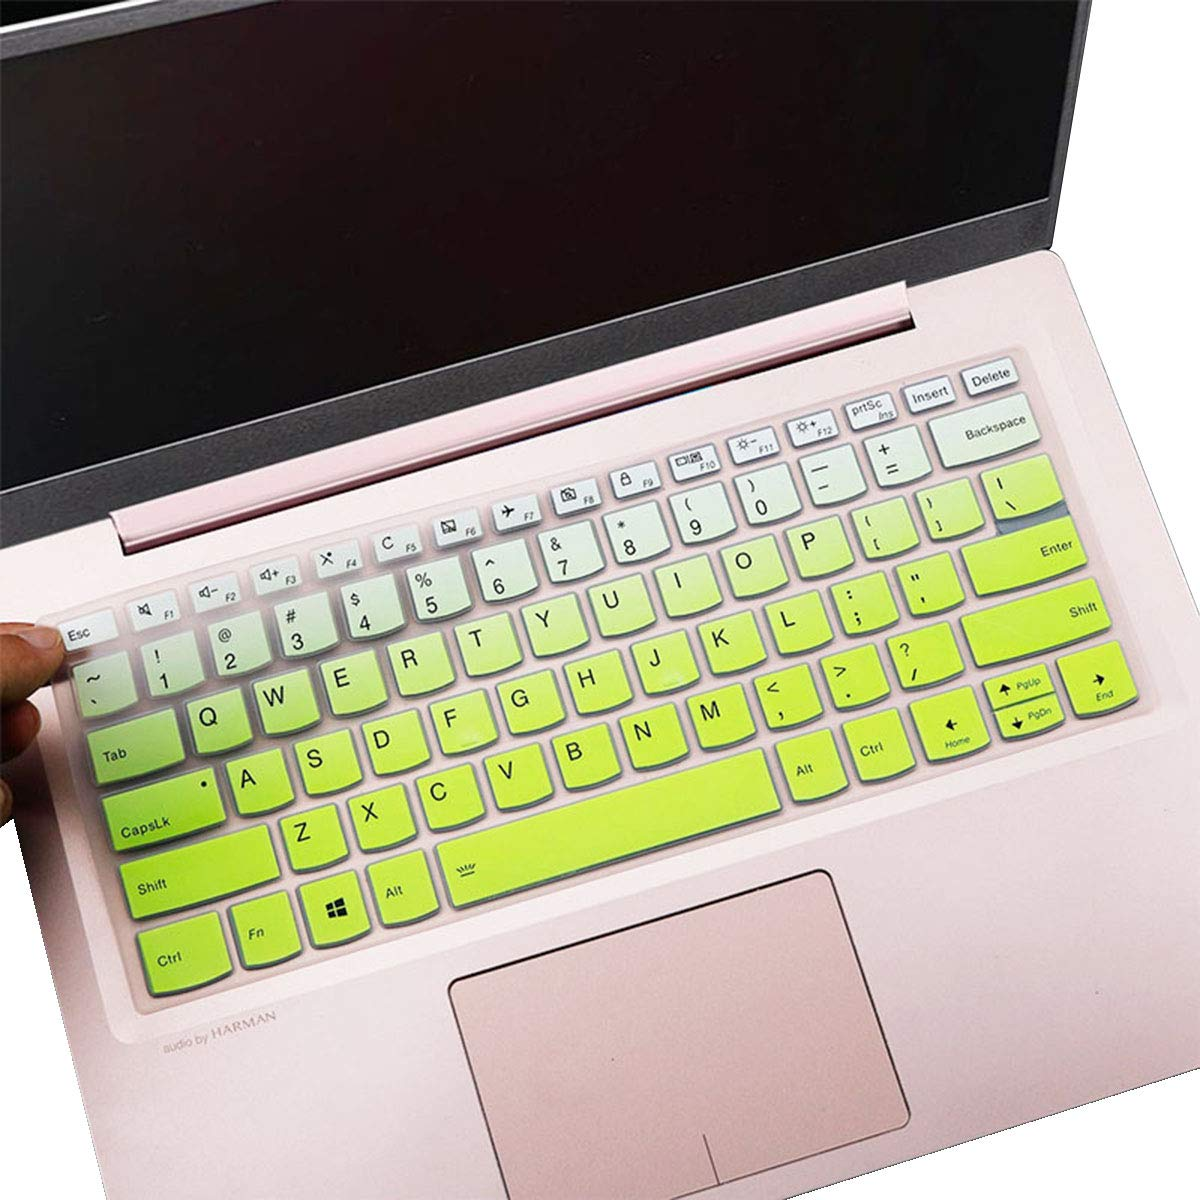 Keyboard Cover For Lenovo Yoga 720 720s 730 13 3 Yoga 730 15 6 Yoga C940 C930 930 920 13 9 Yoga 720 12 5 Yoga C740 14 Lenovo Flex 14 Lenovo